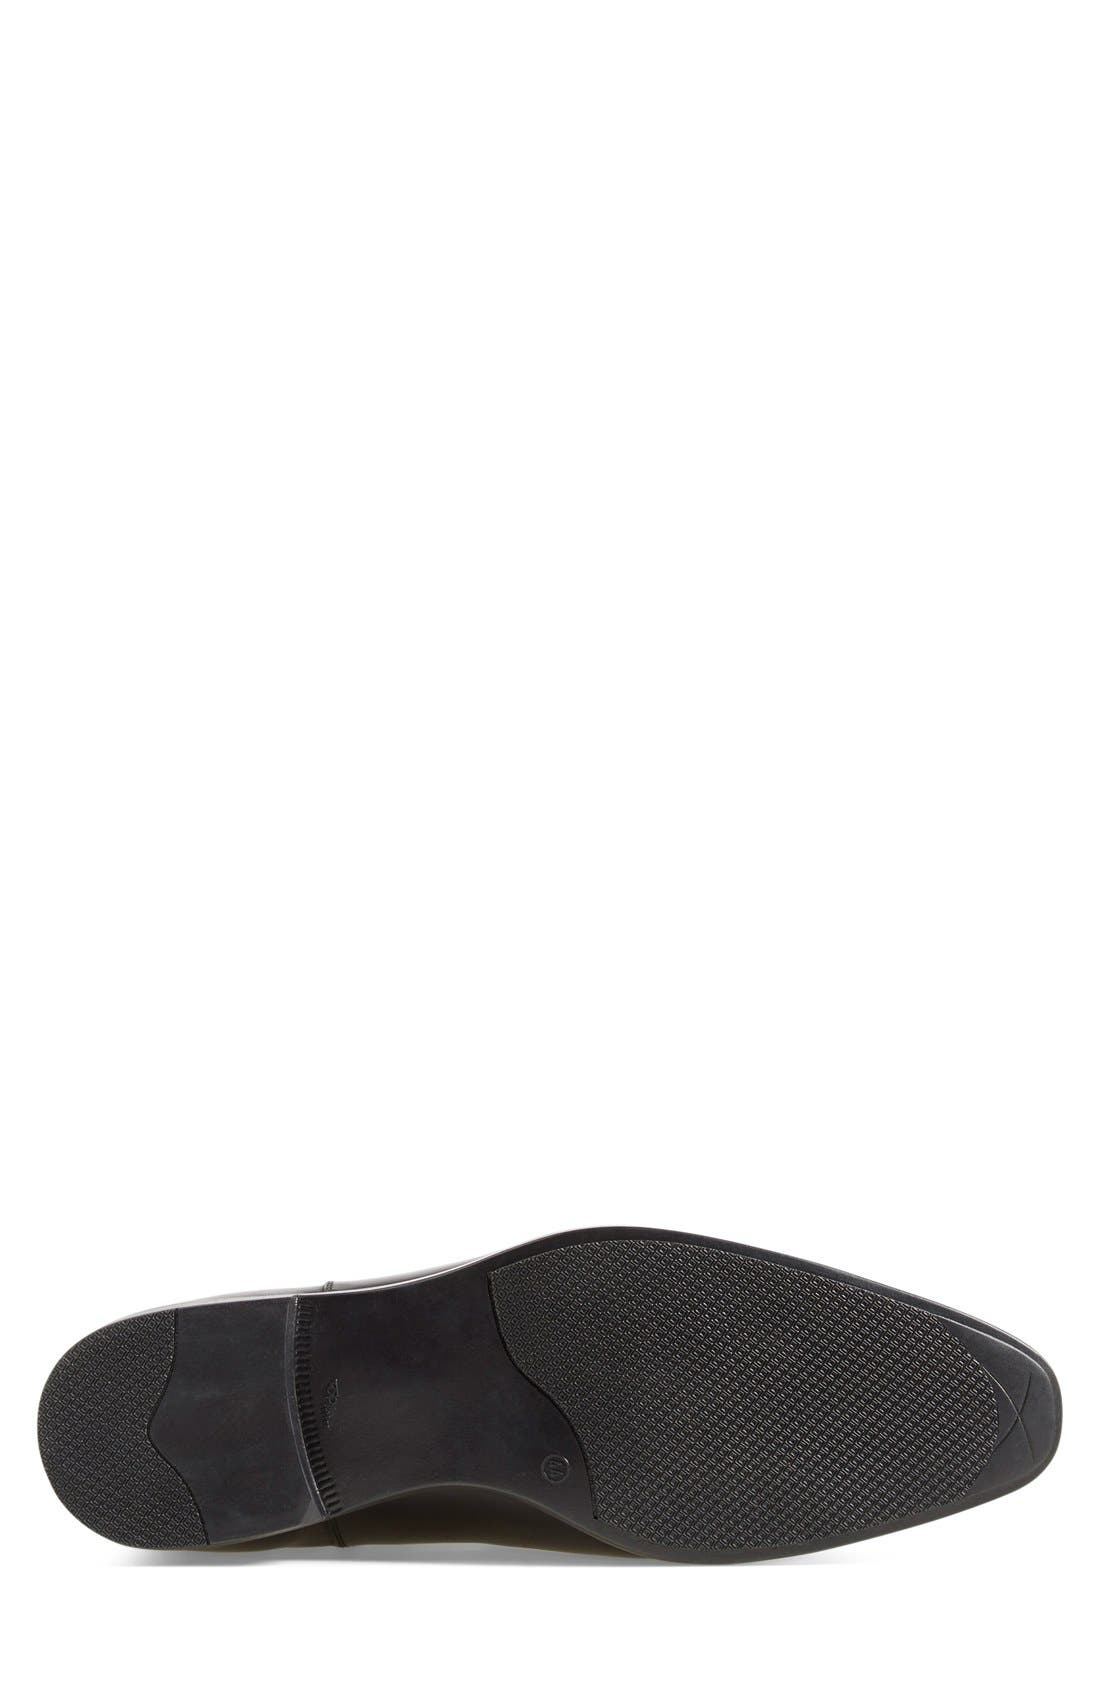 'Canton' Chelsea Boot,                             Alternate thumbnail 4, color,                             Black